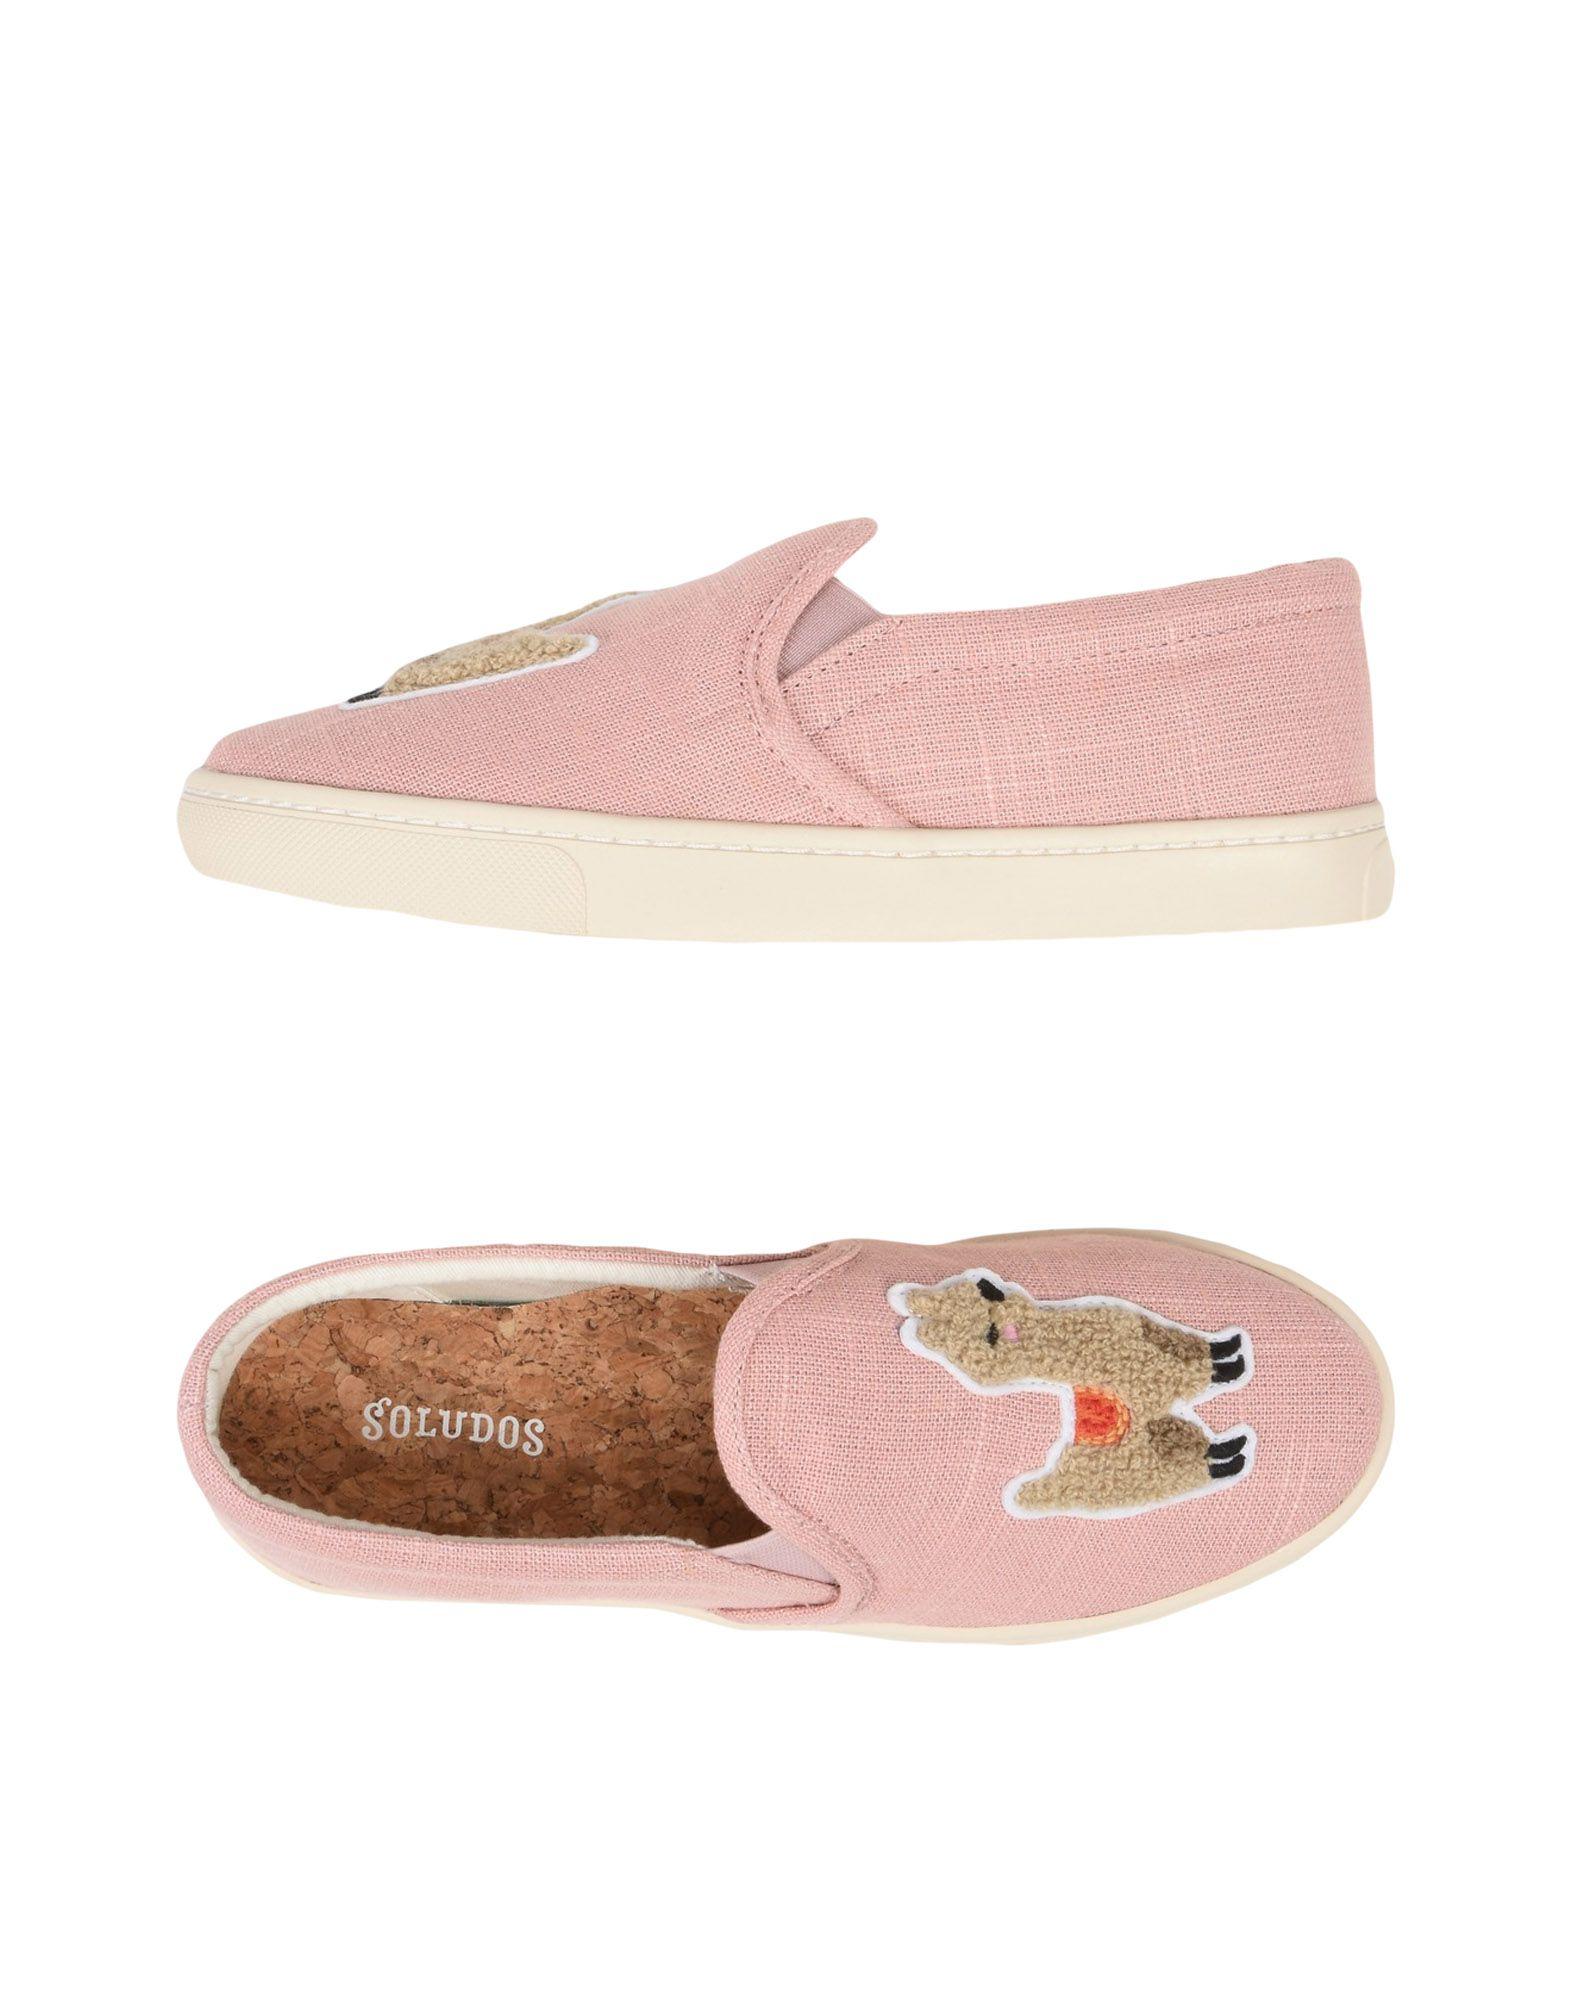 Soludos Llama Slip On Sneaker  11477843VG Gute Qualität beliebte Schuhe